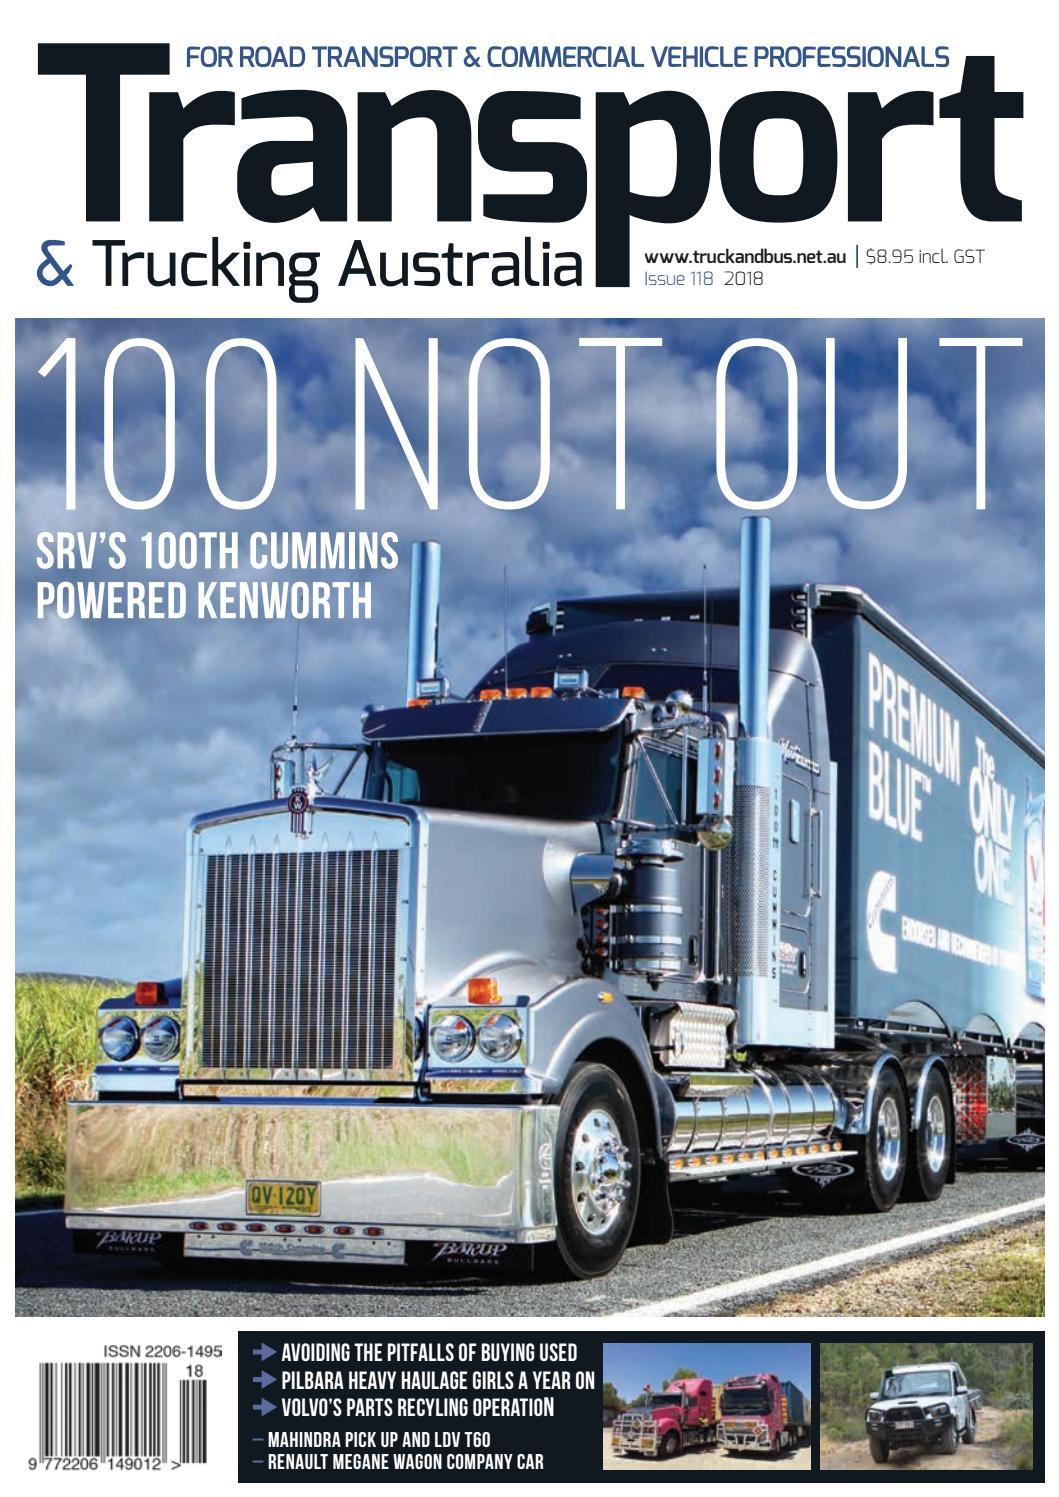 Transport & Trucking Australia issue 118 by Transport